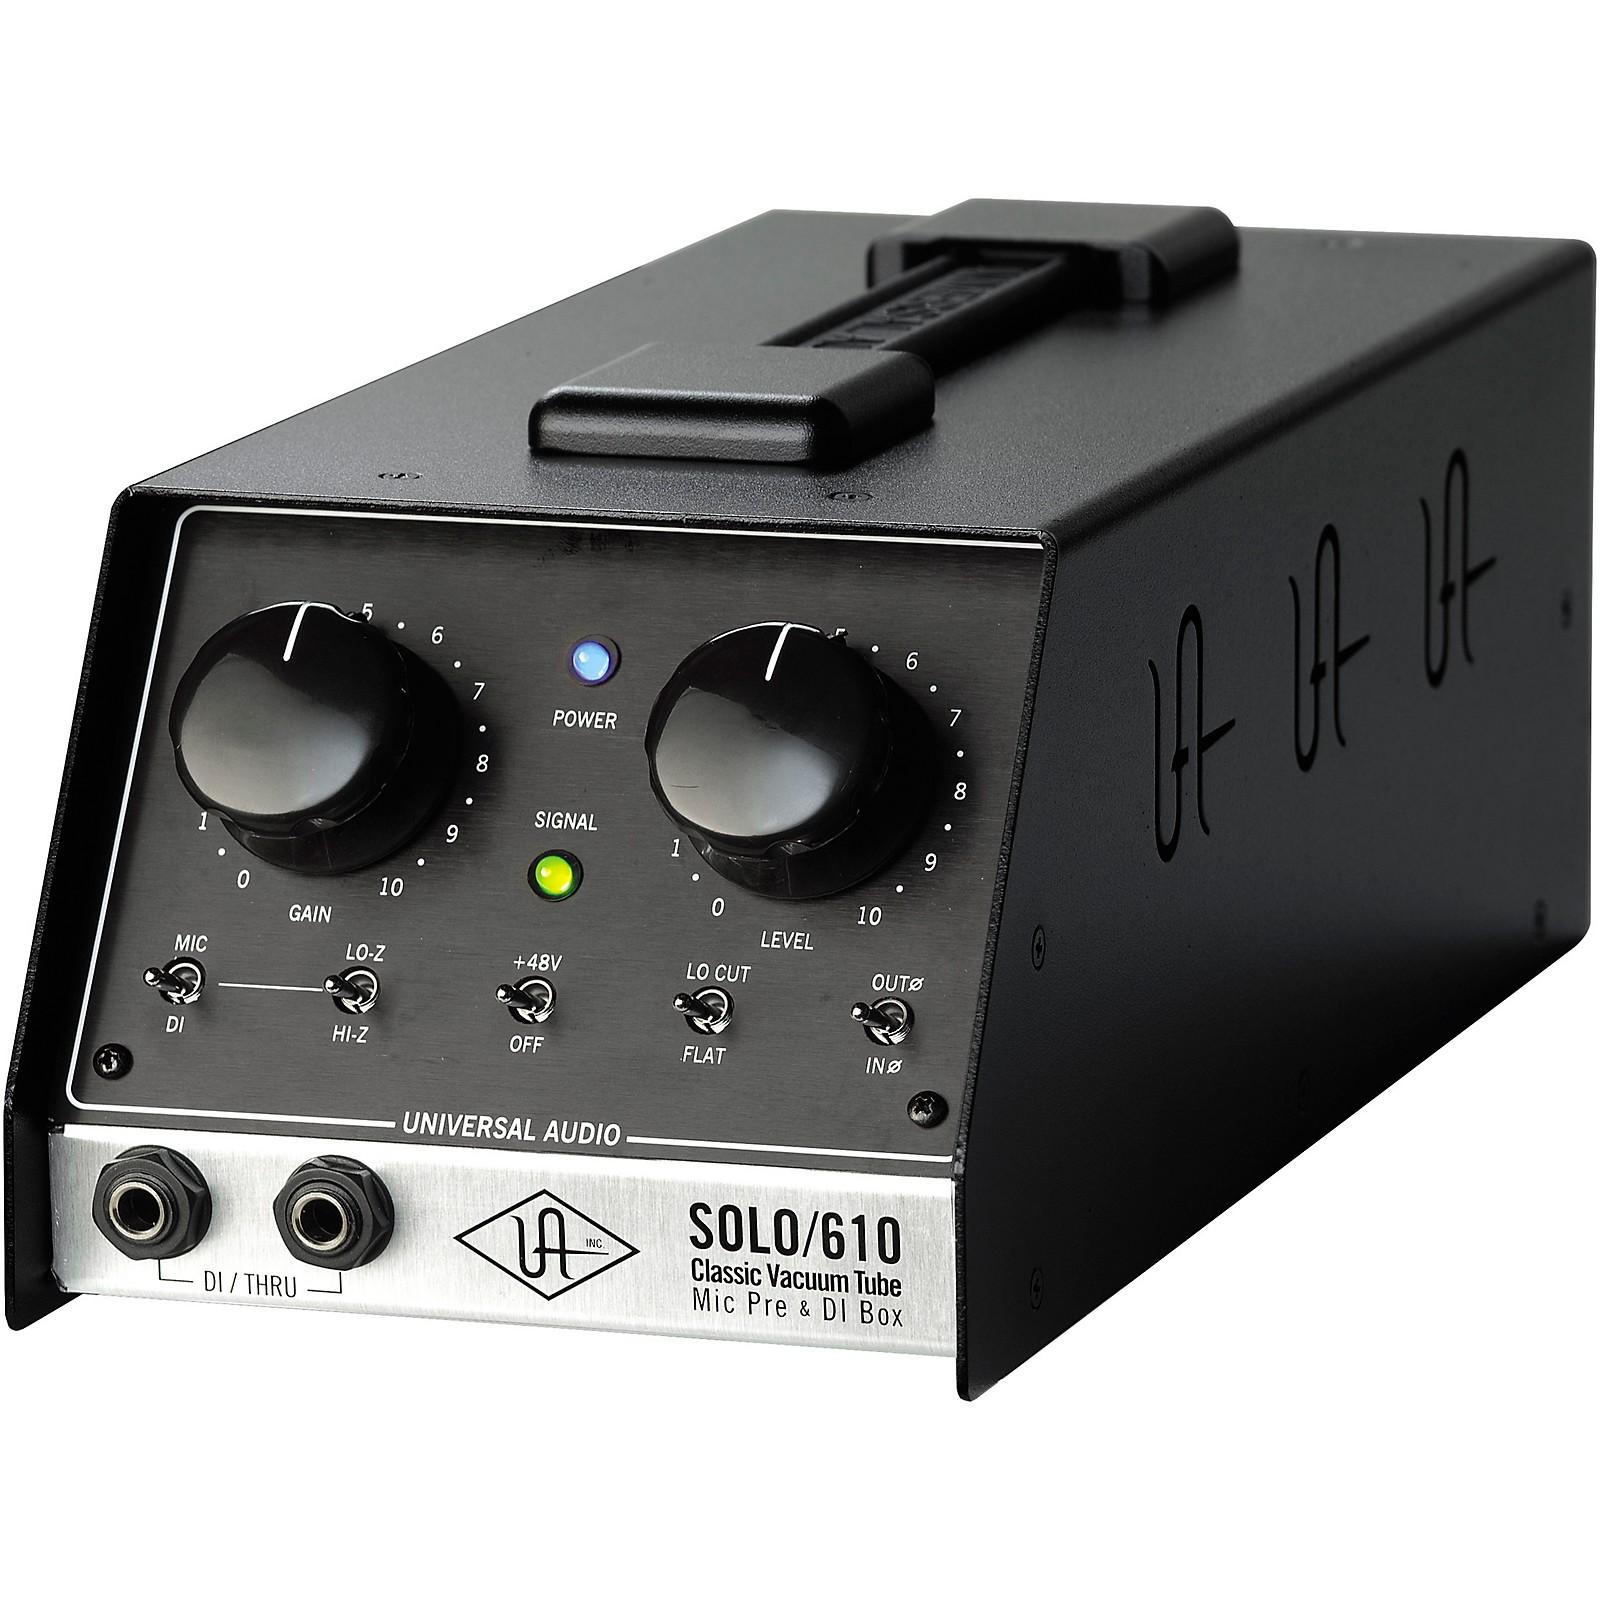 Universal Audio UA-S610 SOLO/610 Classic Vacuum Tube Microphone Preamp and DI Box